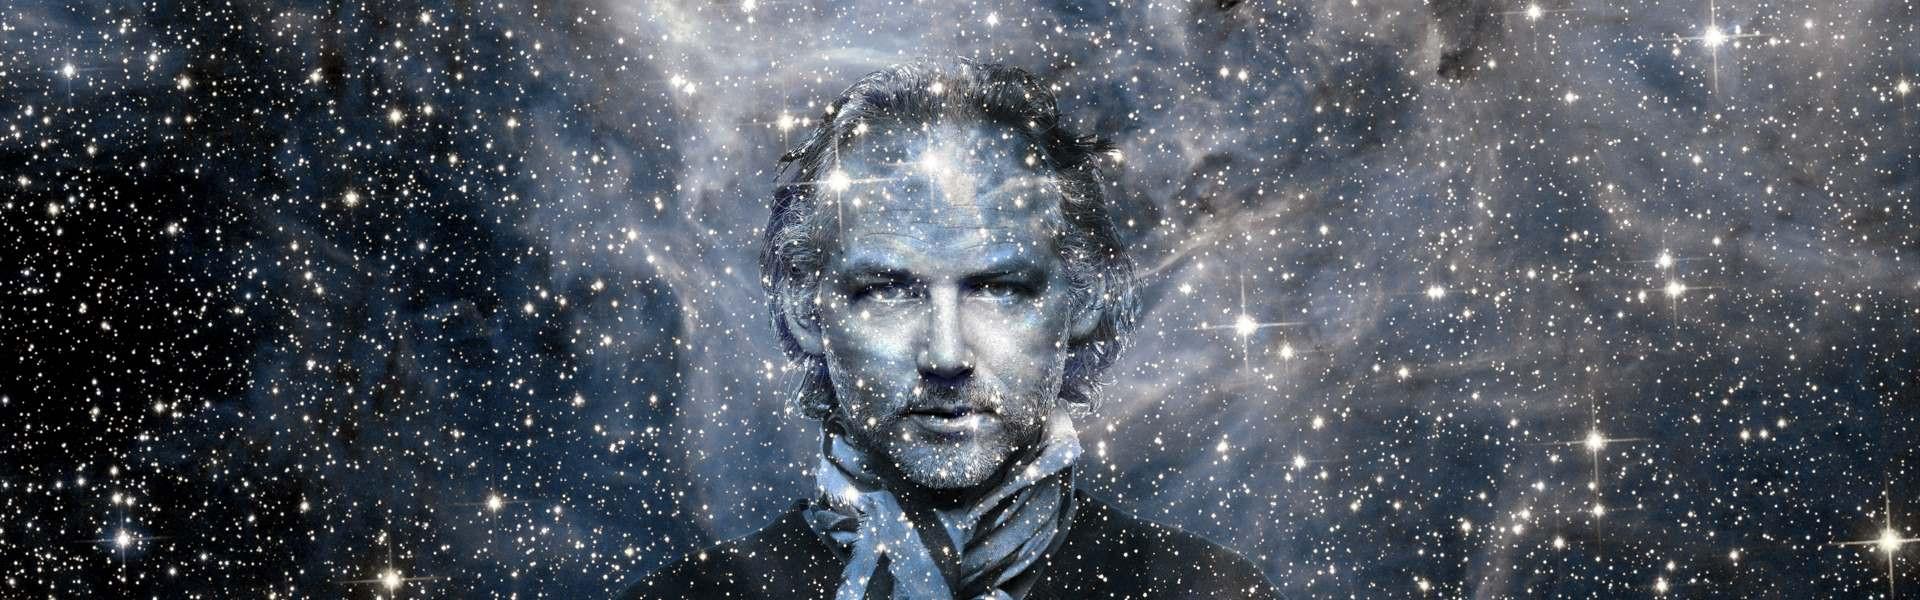 Klangsphäre - DJ & Space: Richard Dorfmeister